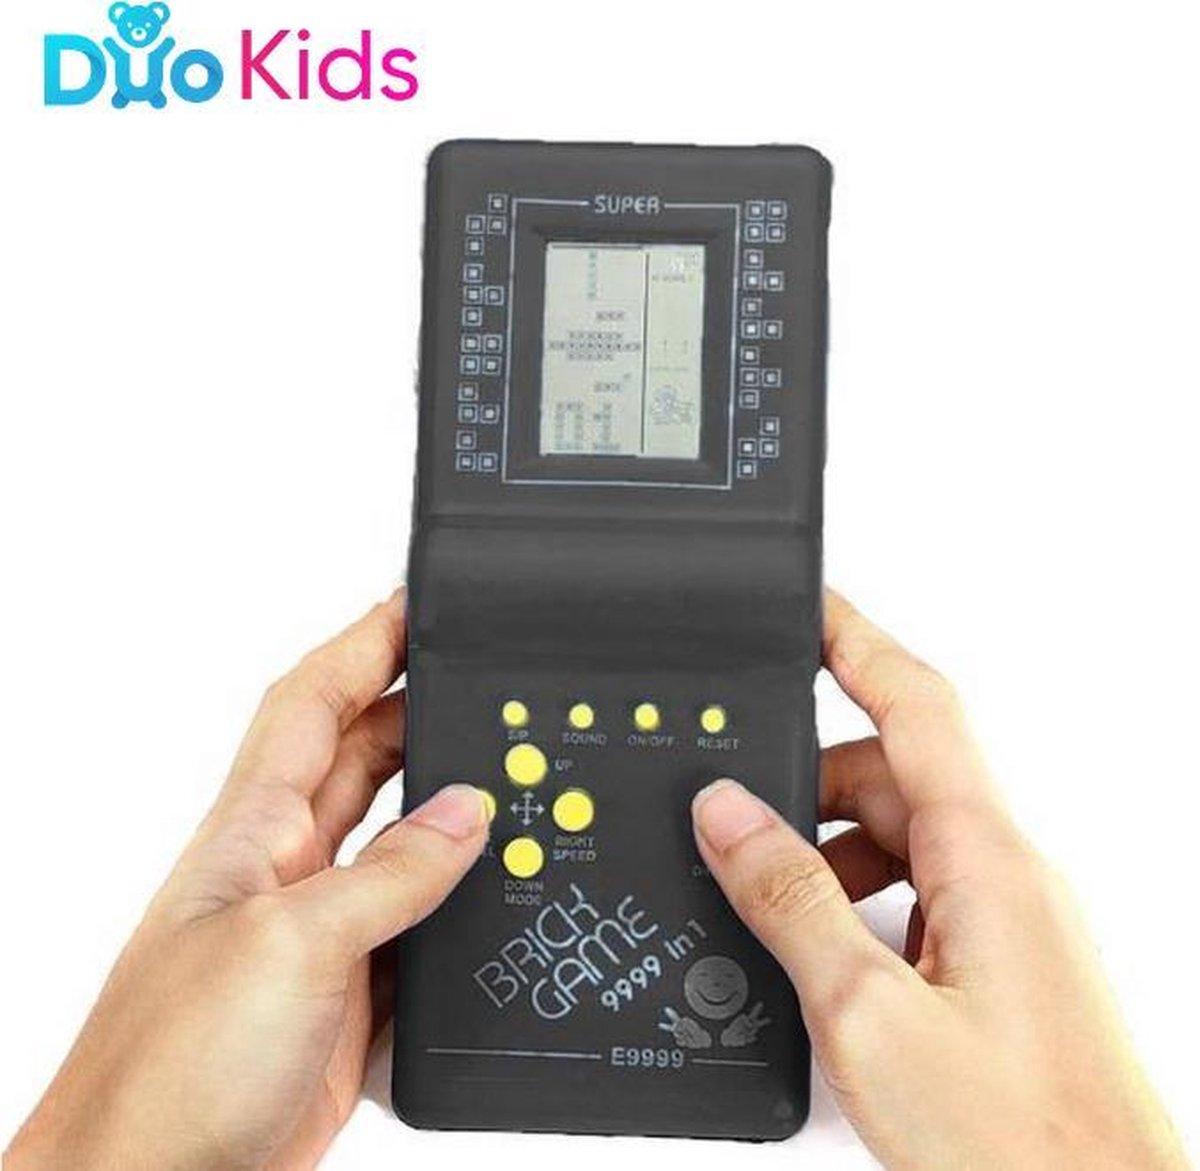 Duo Kids - Retro Arcade - Tetris Elektronisch spel - Brick Game spelcomputer - 18 x 7,5 cm